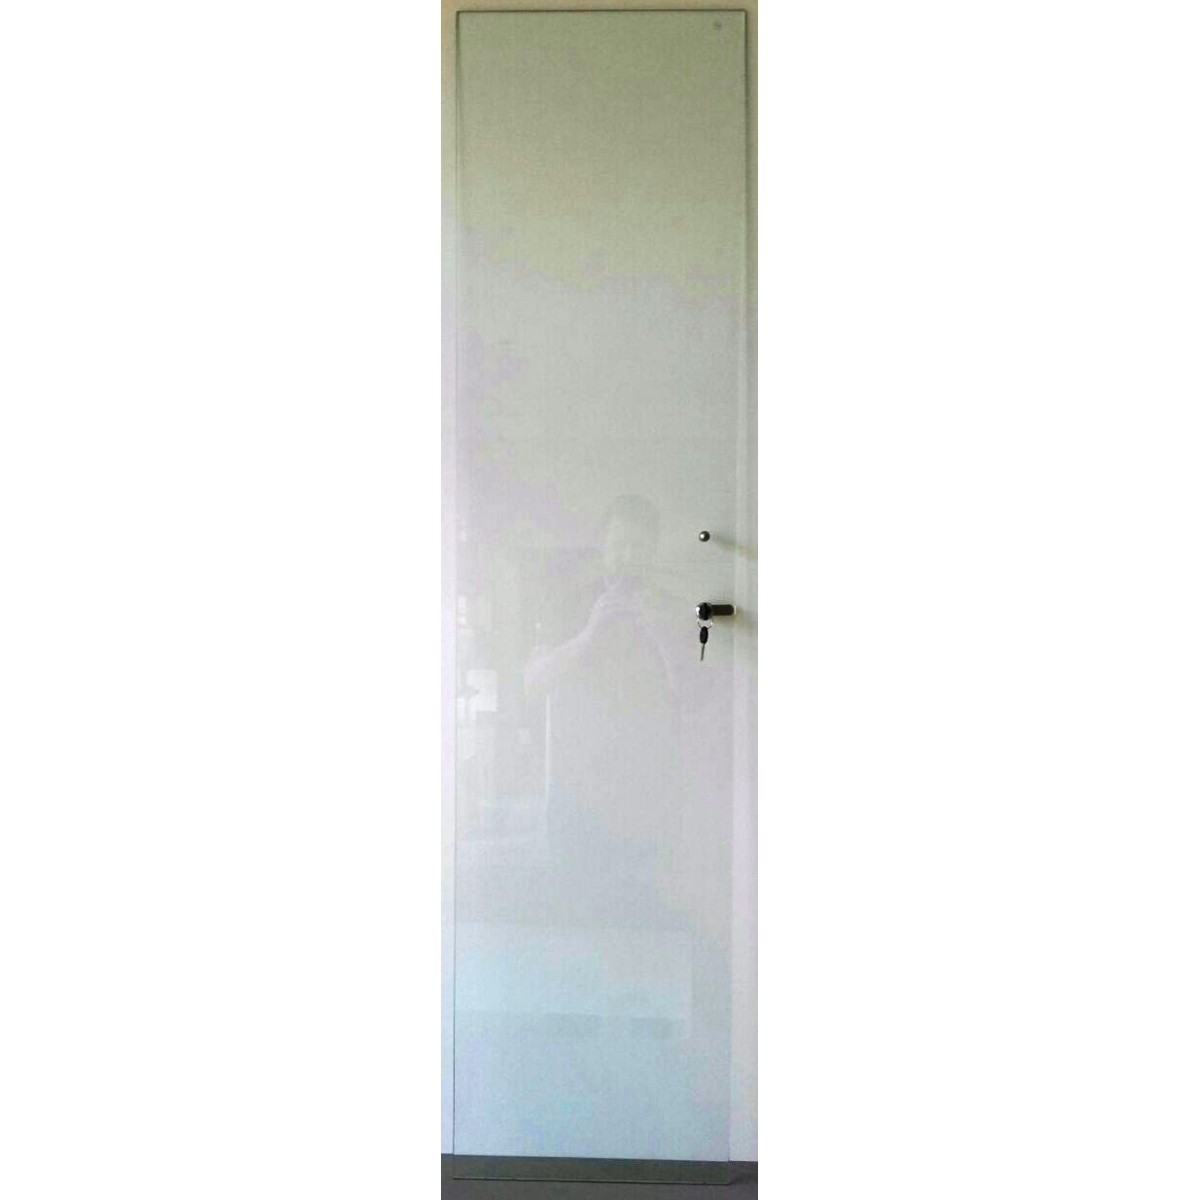 Porta Vidro Incolor com Chave para Estante CD/DVD/Blu-ray